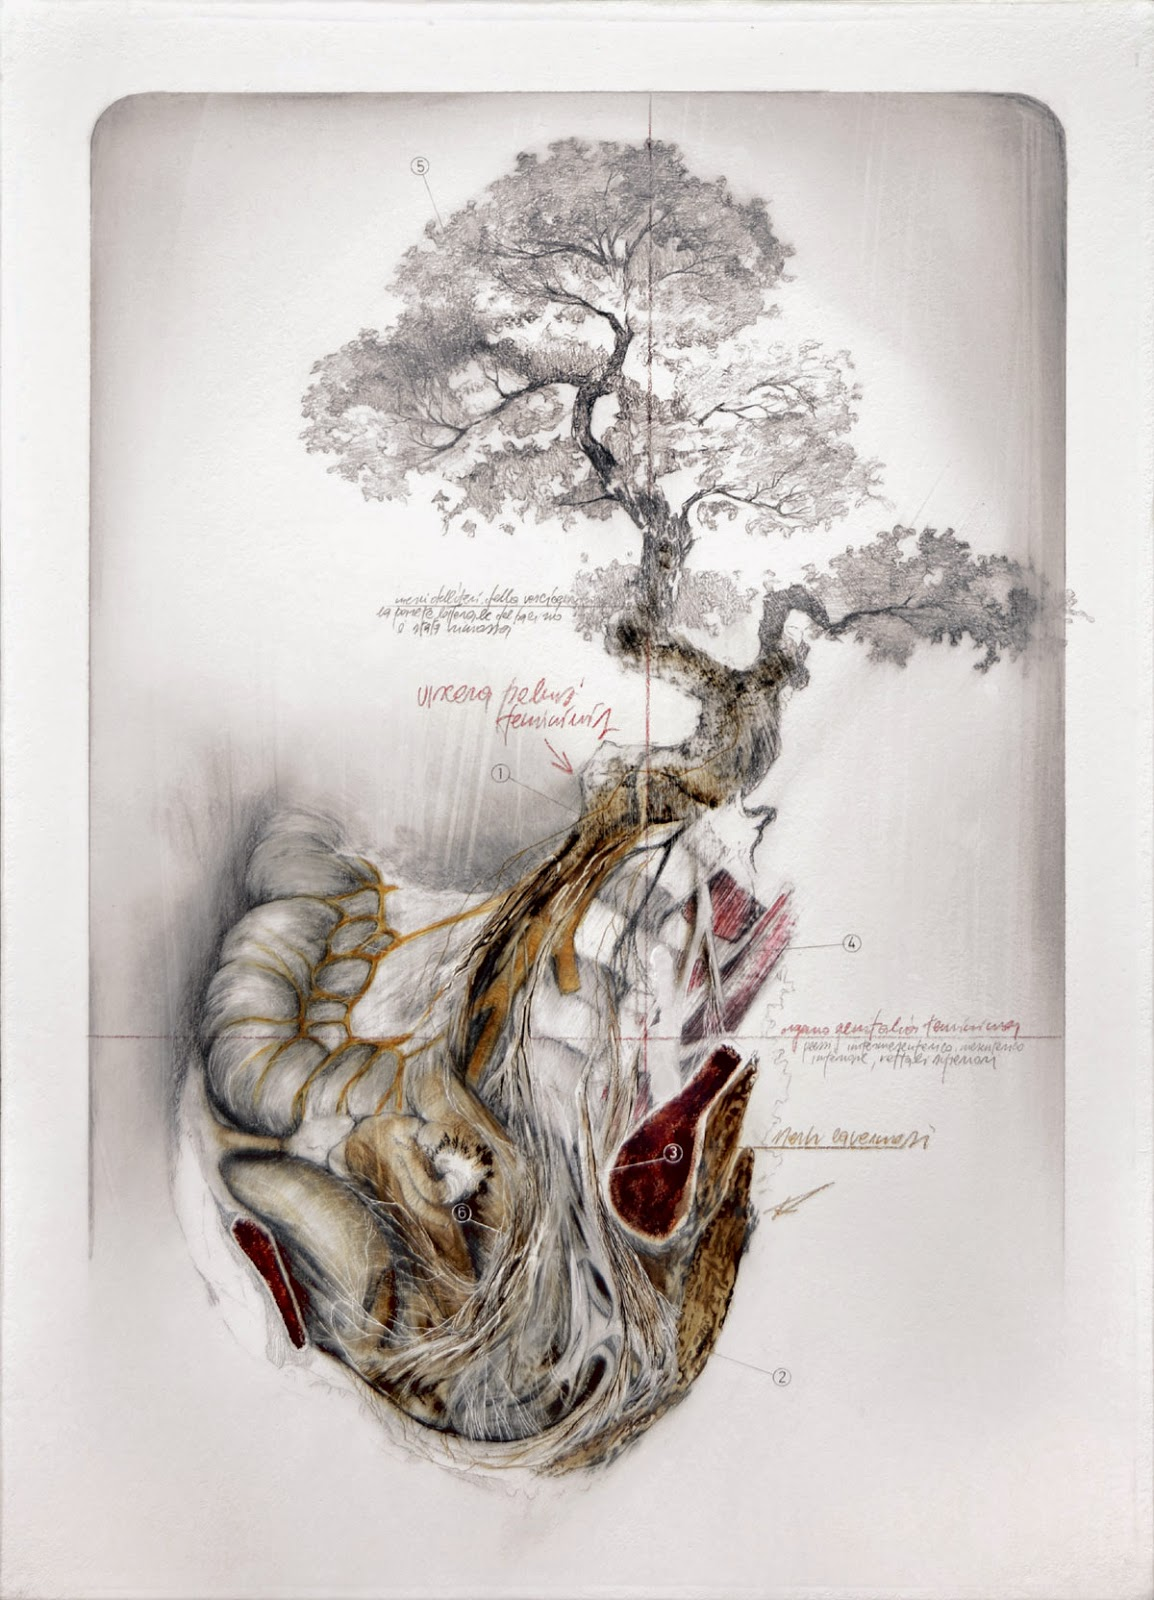 nunzio-paci-human-illustration 8